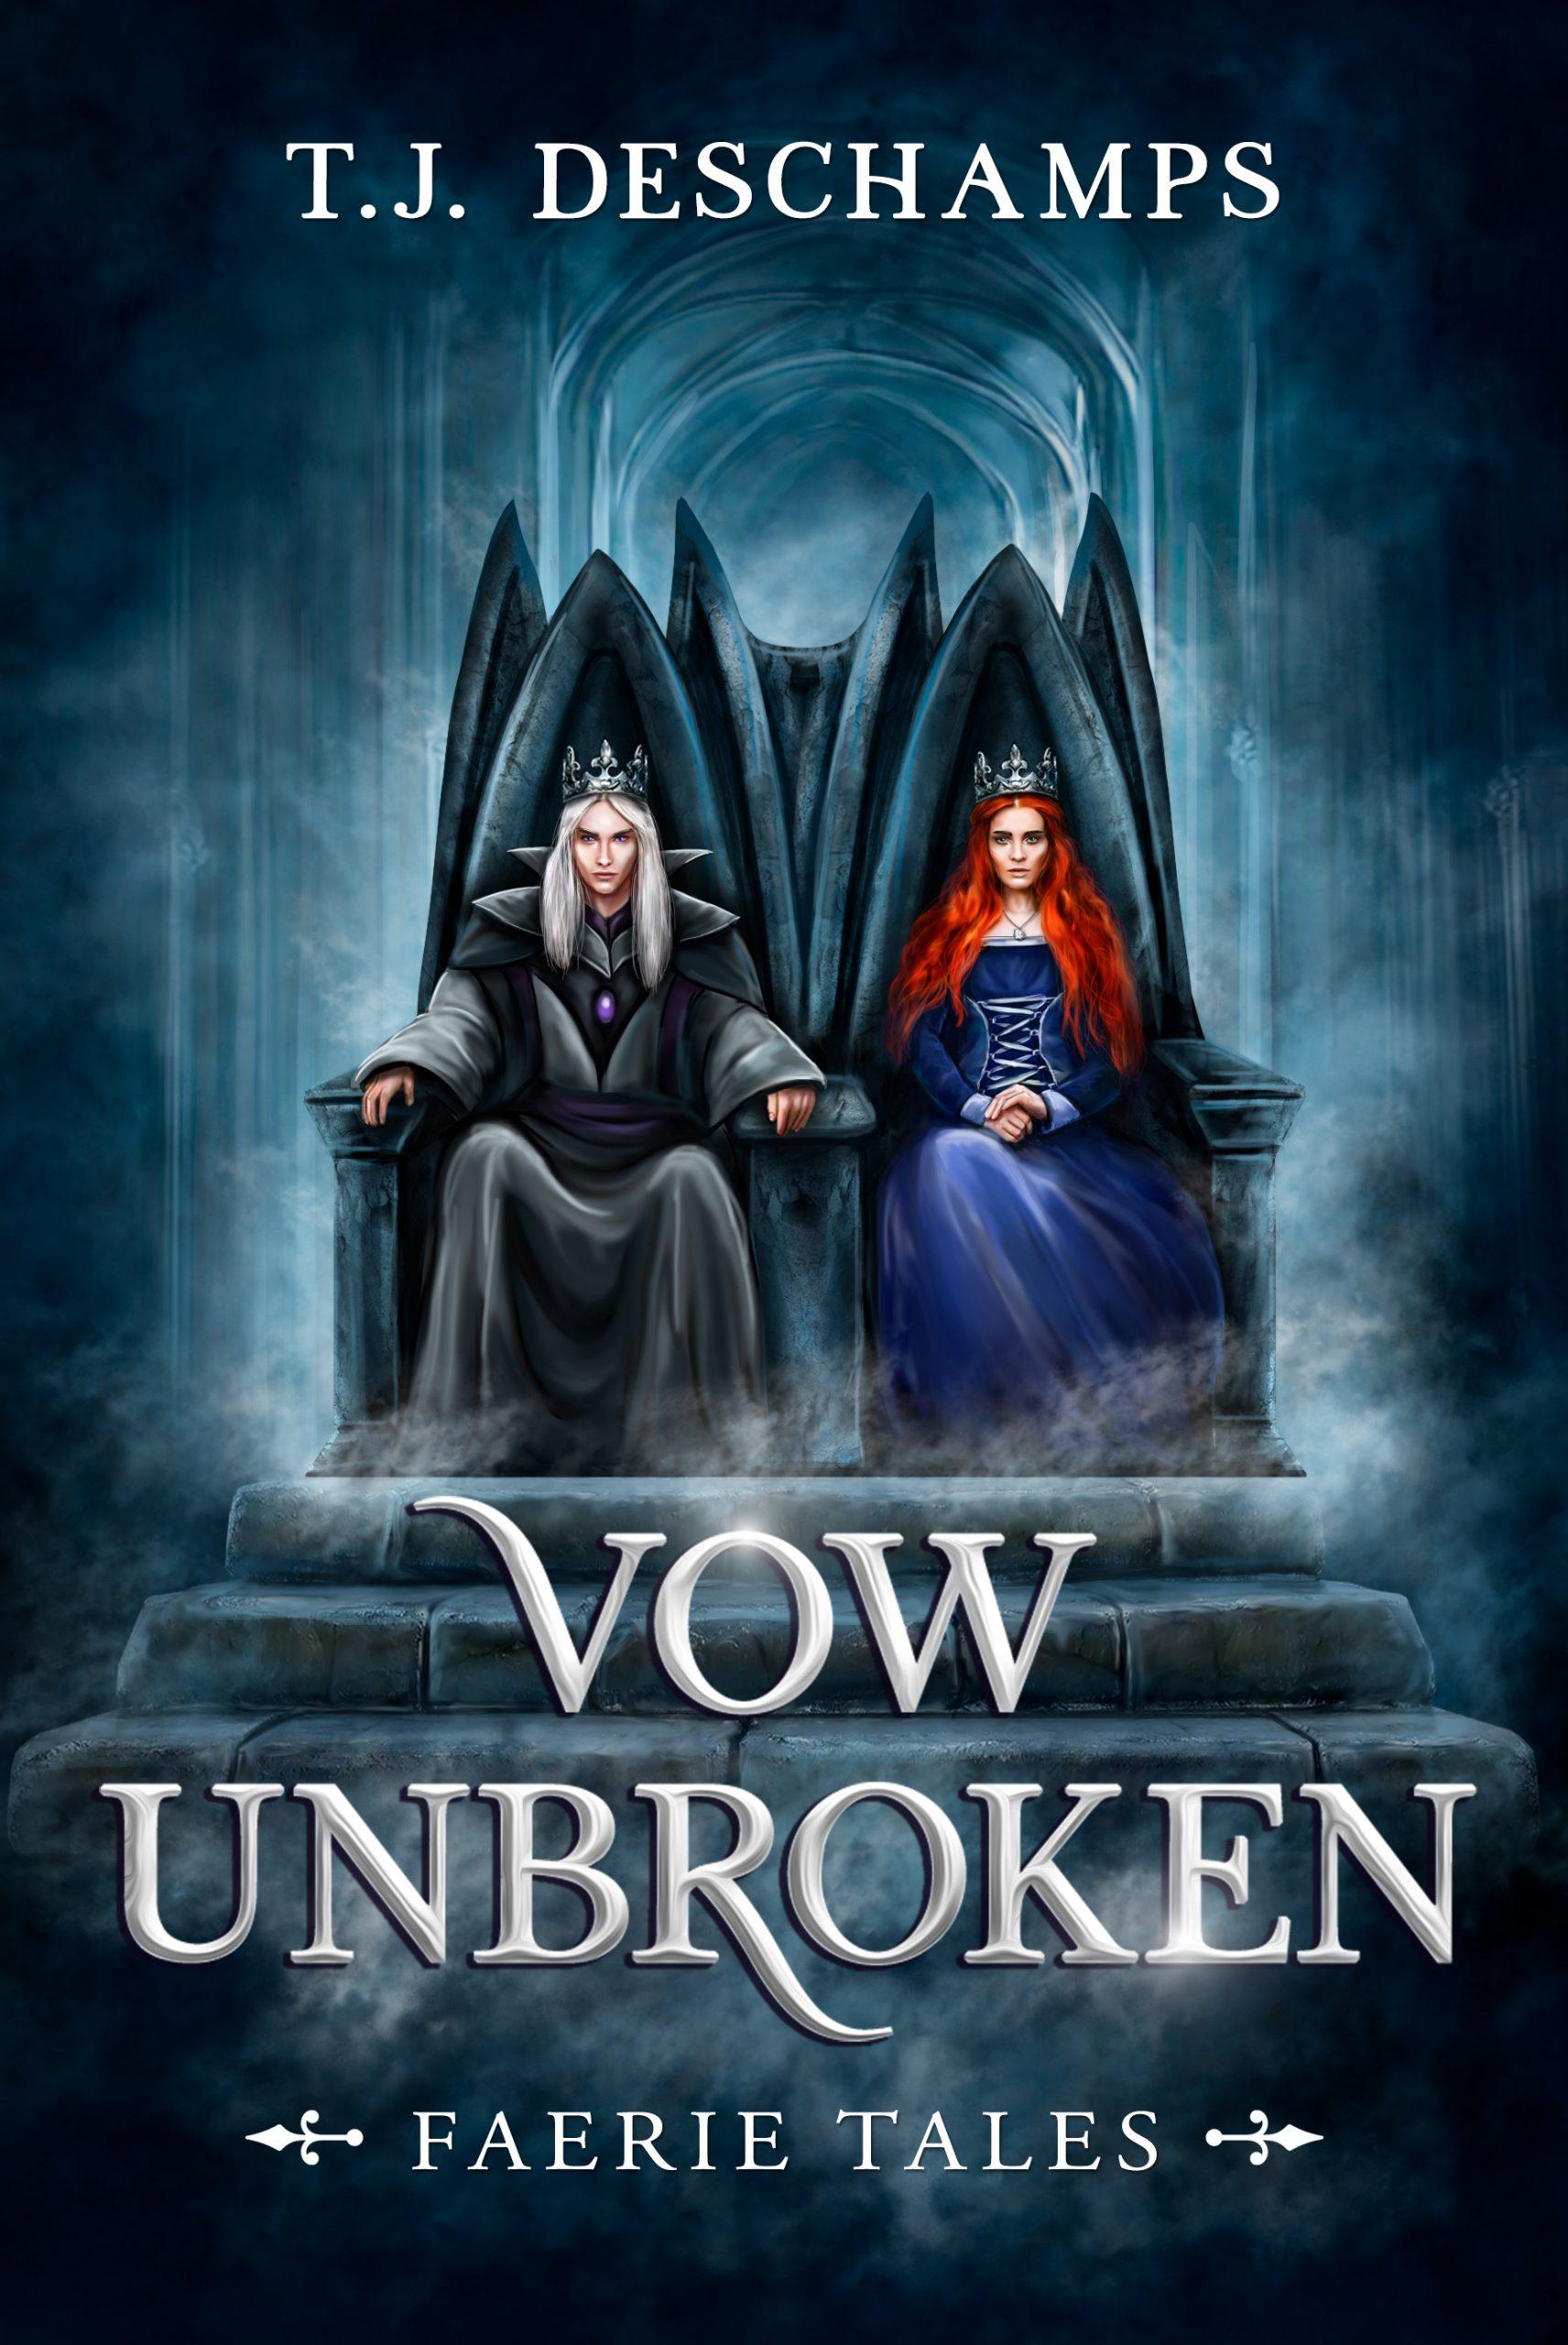 Excerpt from Vow Unbroken (Faerie Tales No. 3) by T.J. Deschamps